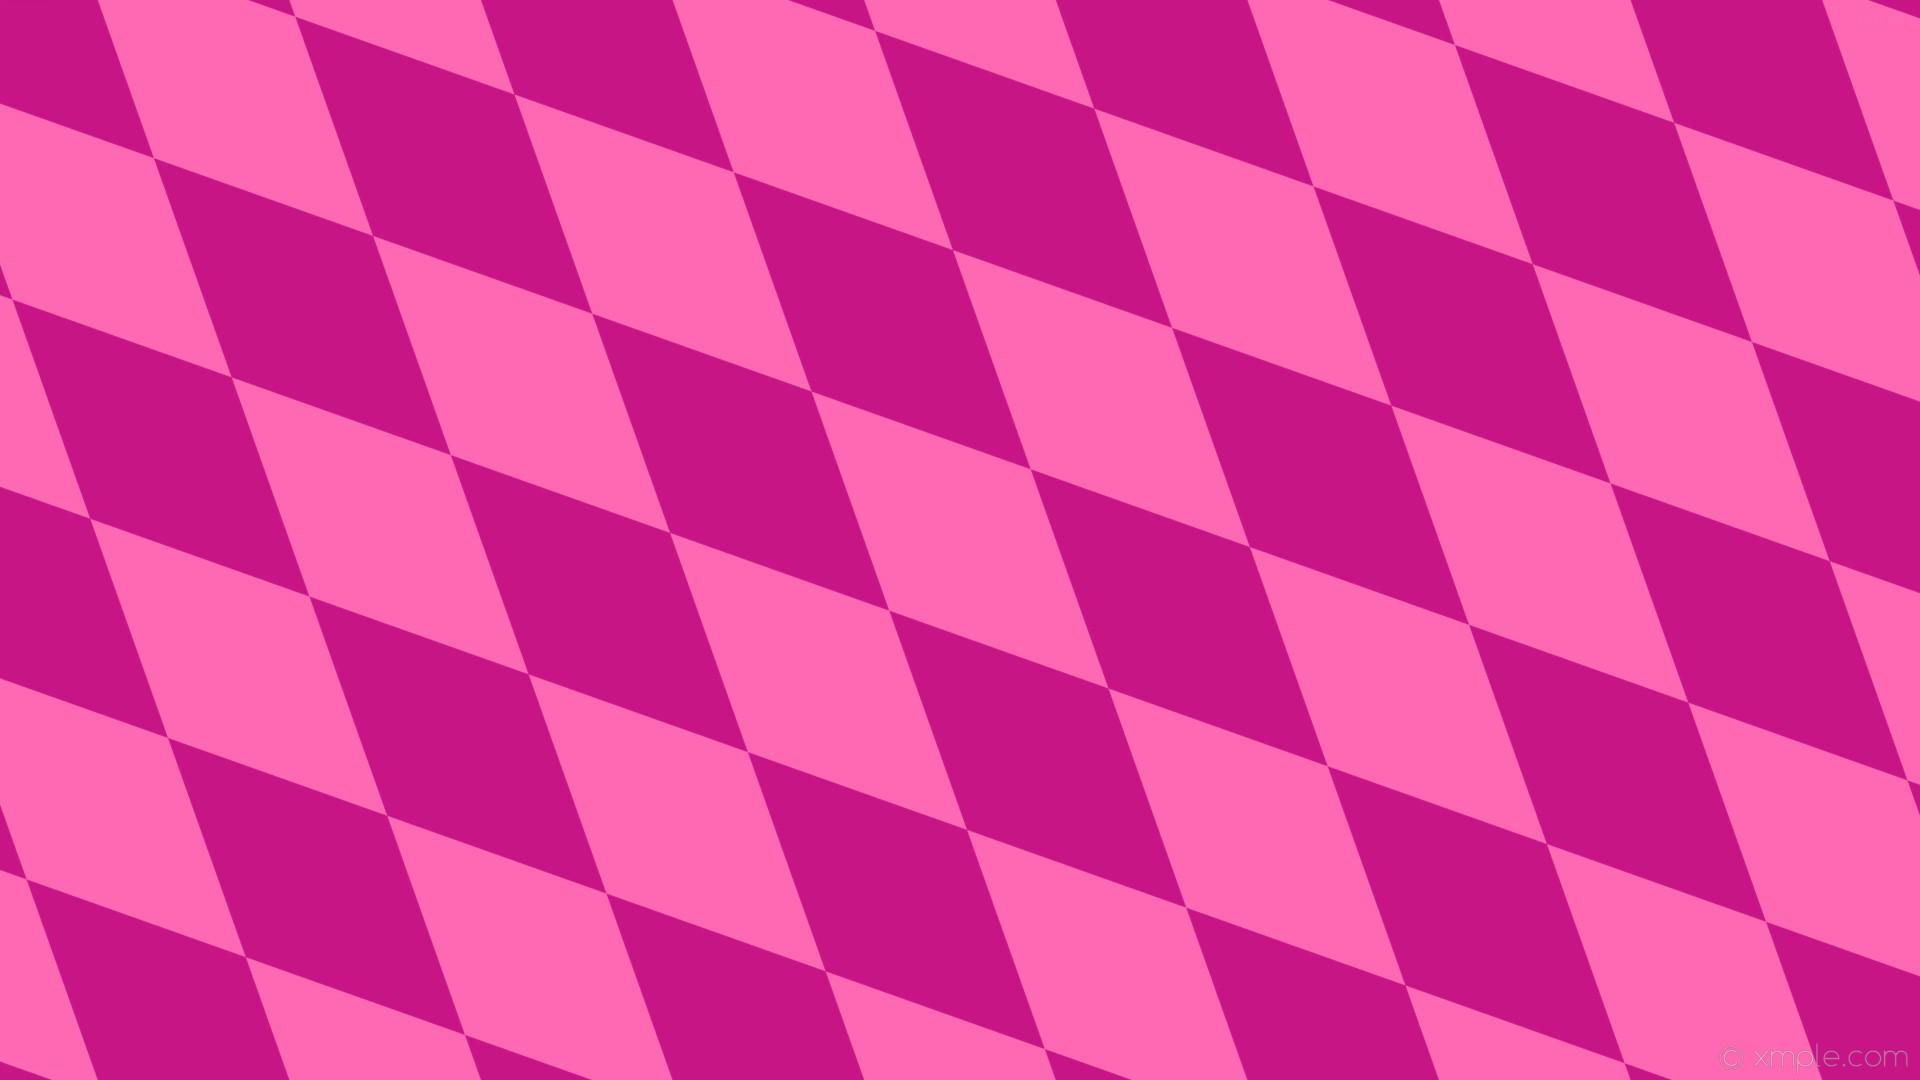 wallpaper pink diamond lozenge rhombus hot pink medium violet red #ff69b4  #c71585 135°